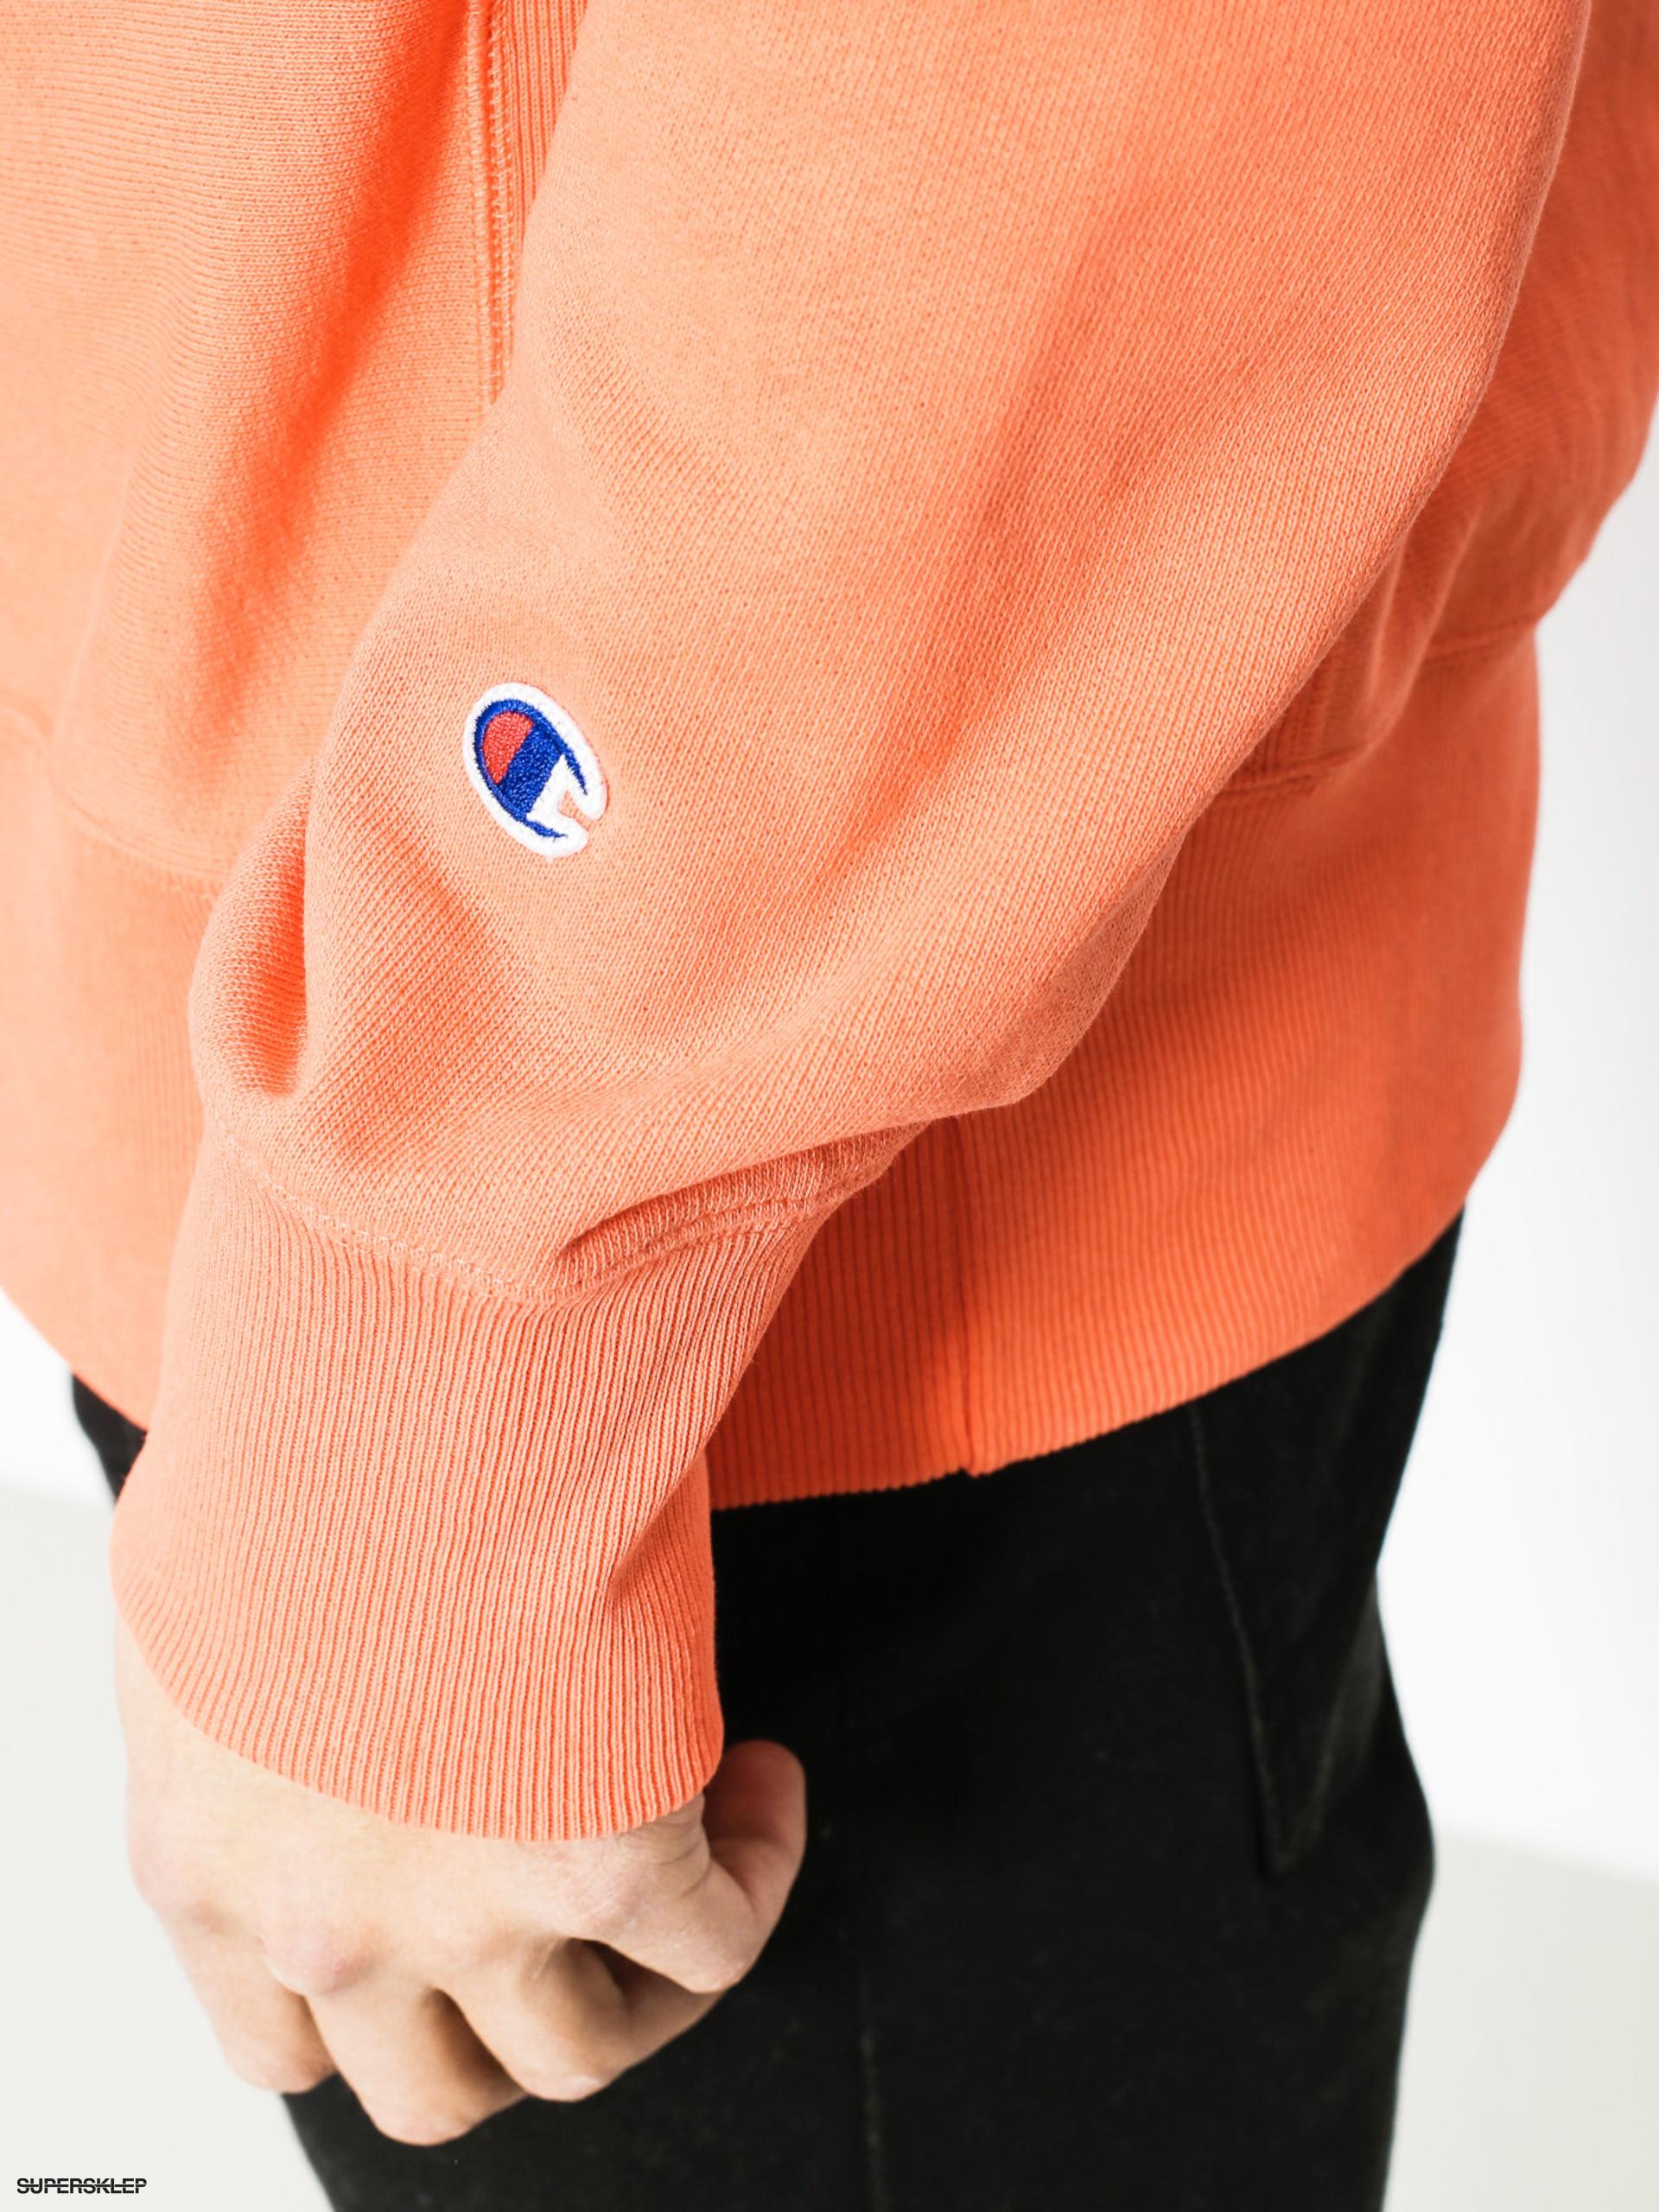 c95c5cfb393d Bluza Champion Reverse Weave Crewneck Sweatshirt (psm)